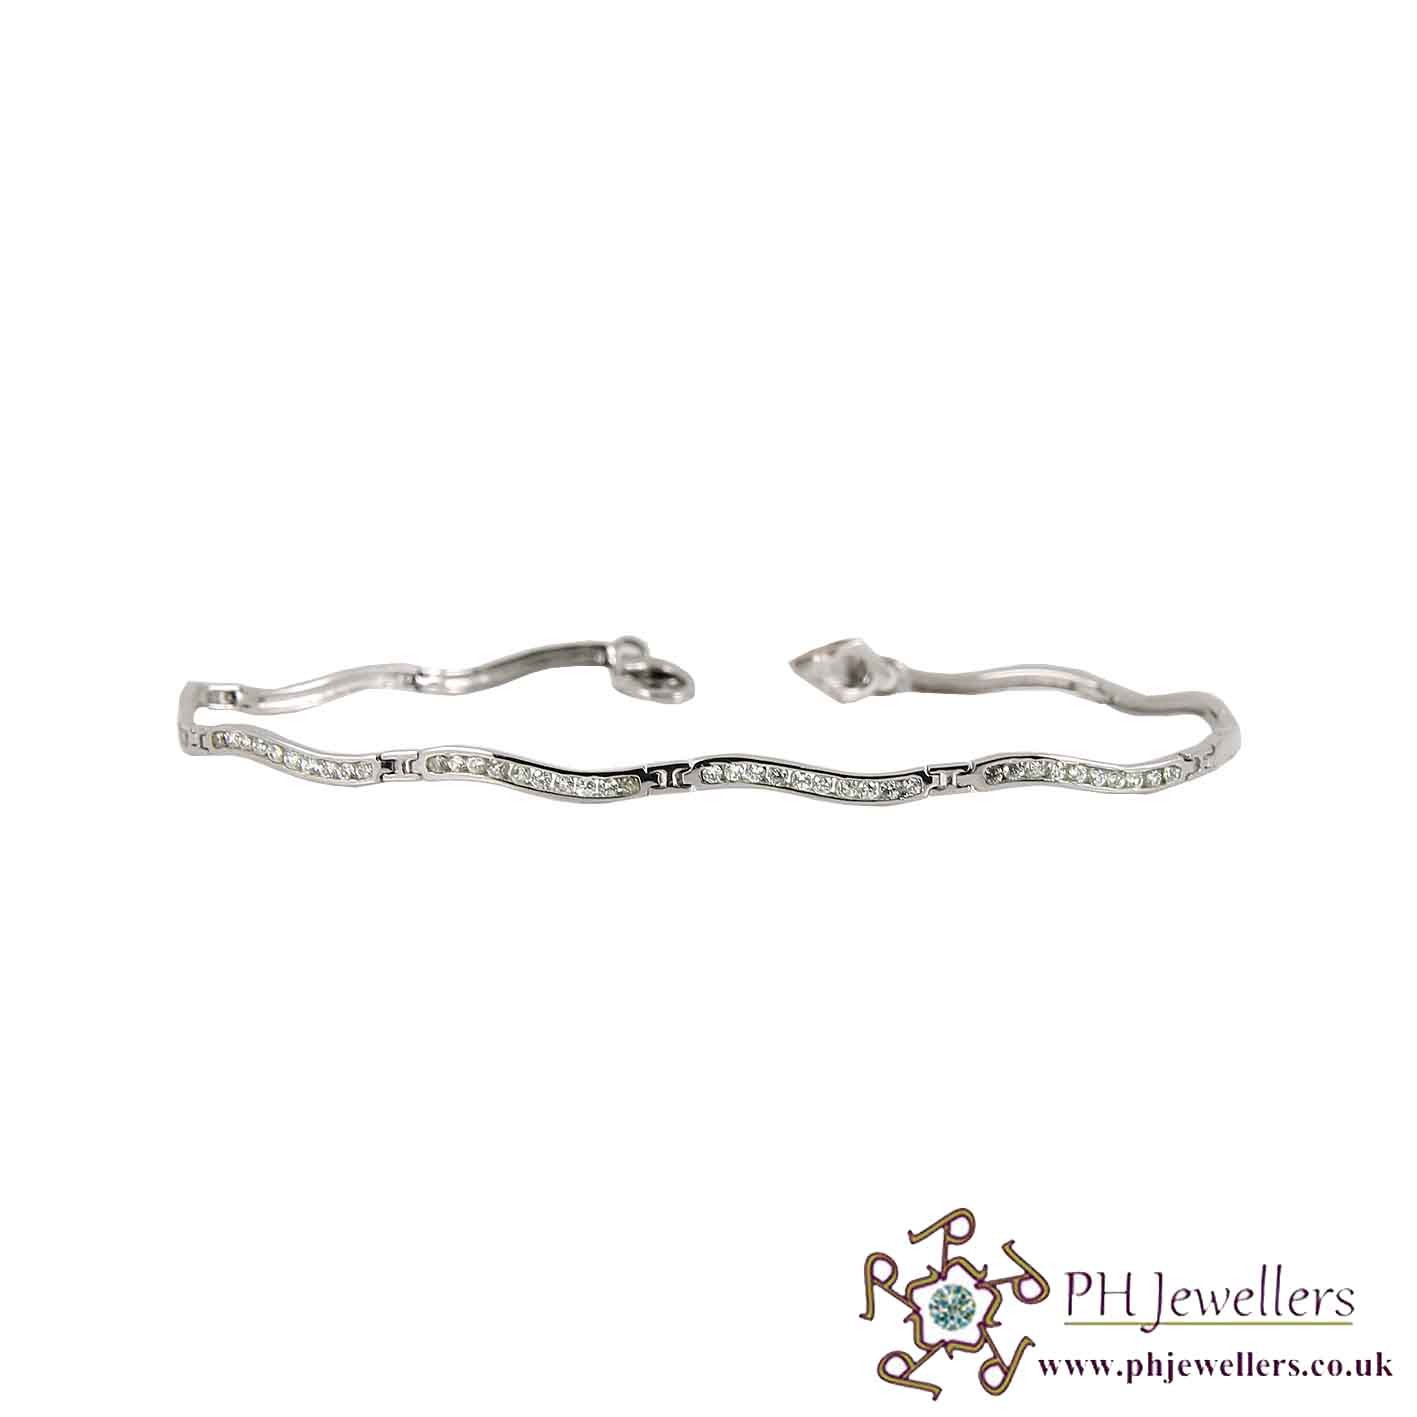 18CT 750 Hallmark White Gold Bracelet CZ WGLB10